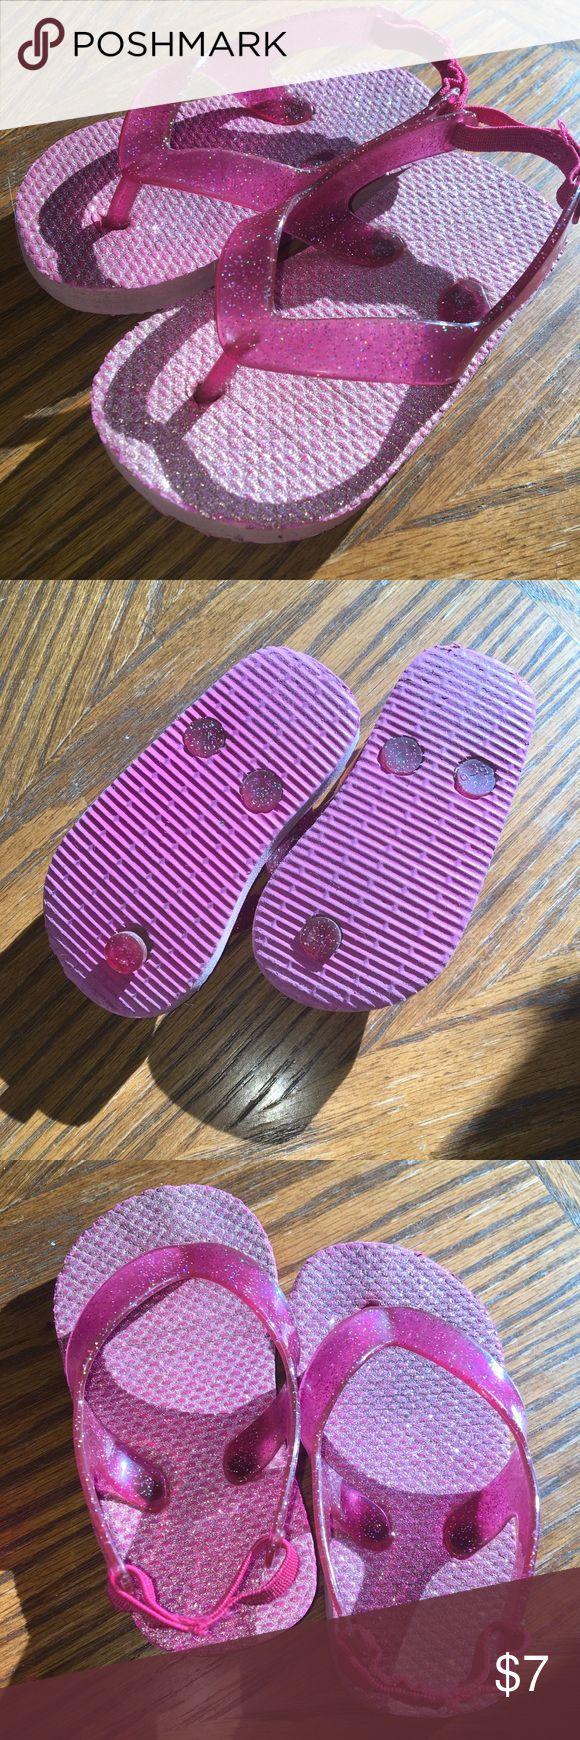 Pink Sparkly Flip Flips Pink Sparkly Flip Flips • Elastic sling back • Plastic thong piece • Foam sole • Still GOOD CONDITION! Shoes Sandals & Flip Flops